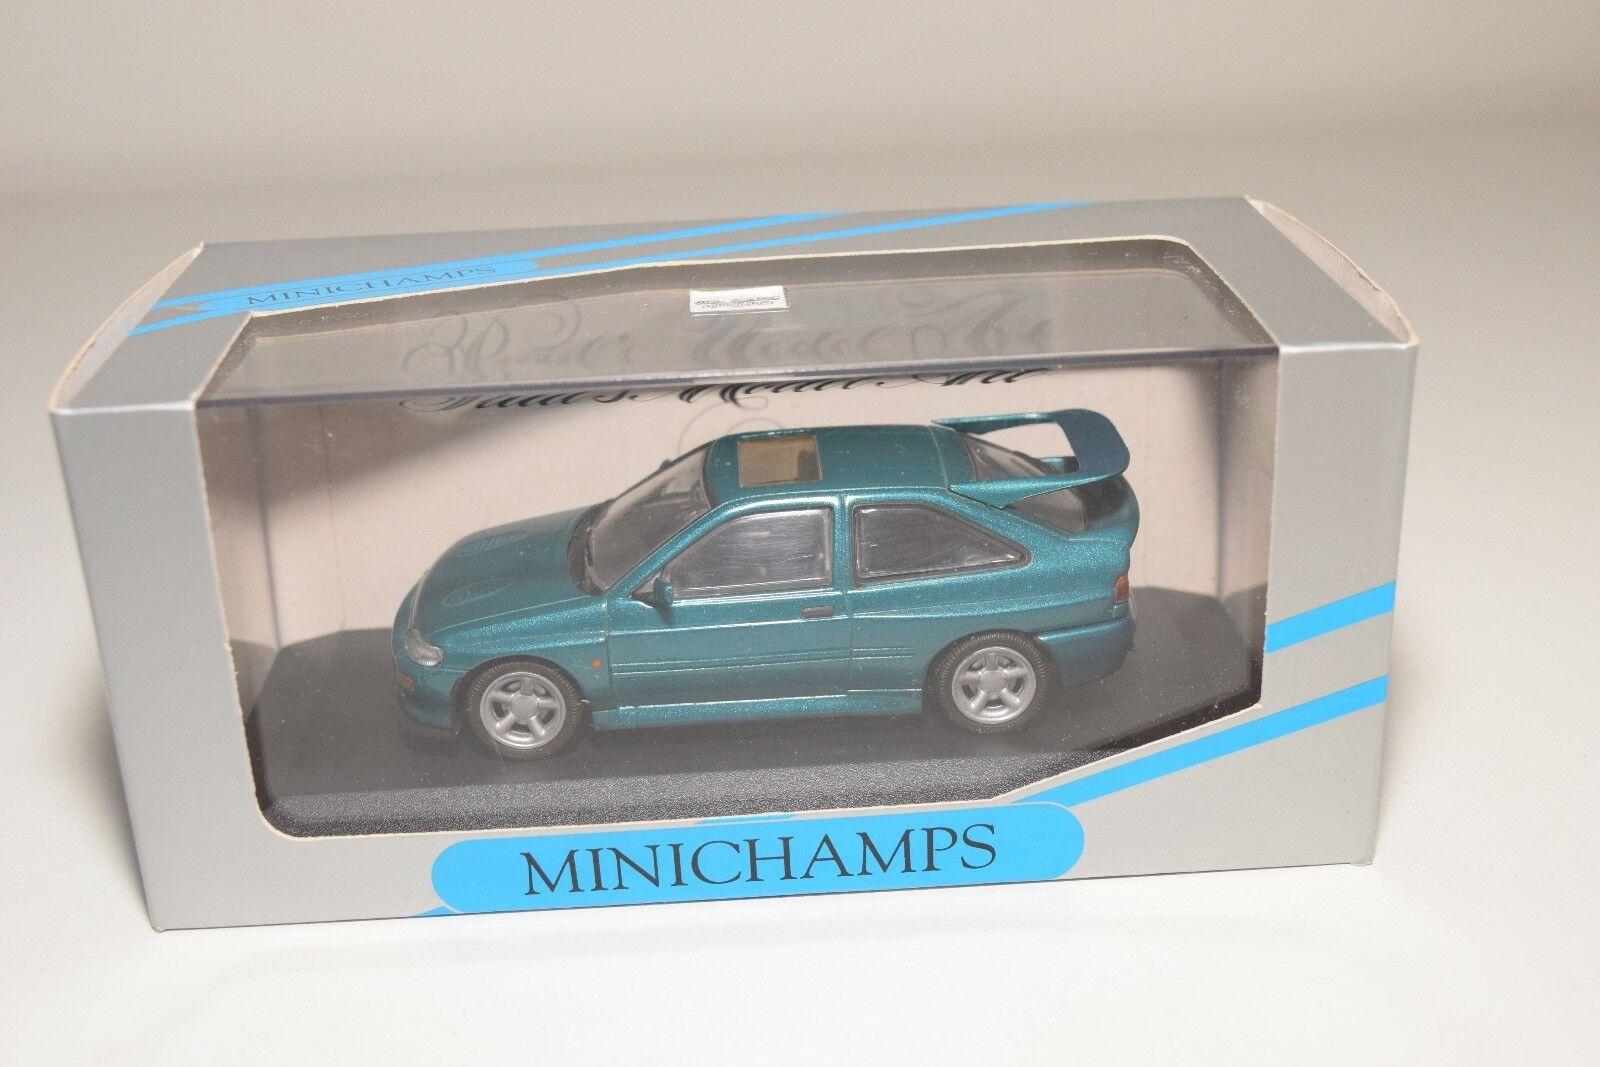 B MINICHAMPS FORD ESCORT COSWORTH METALLIC vert MINT BOXED